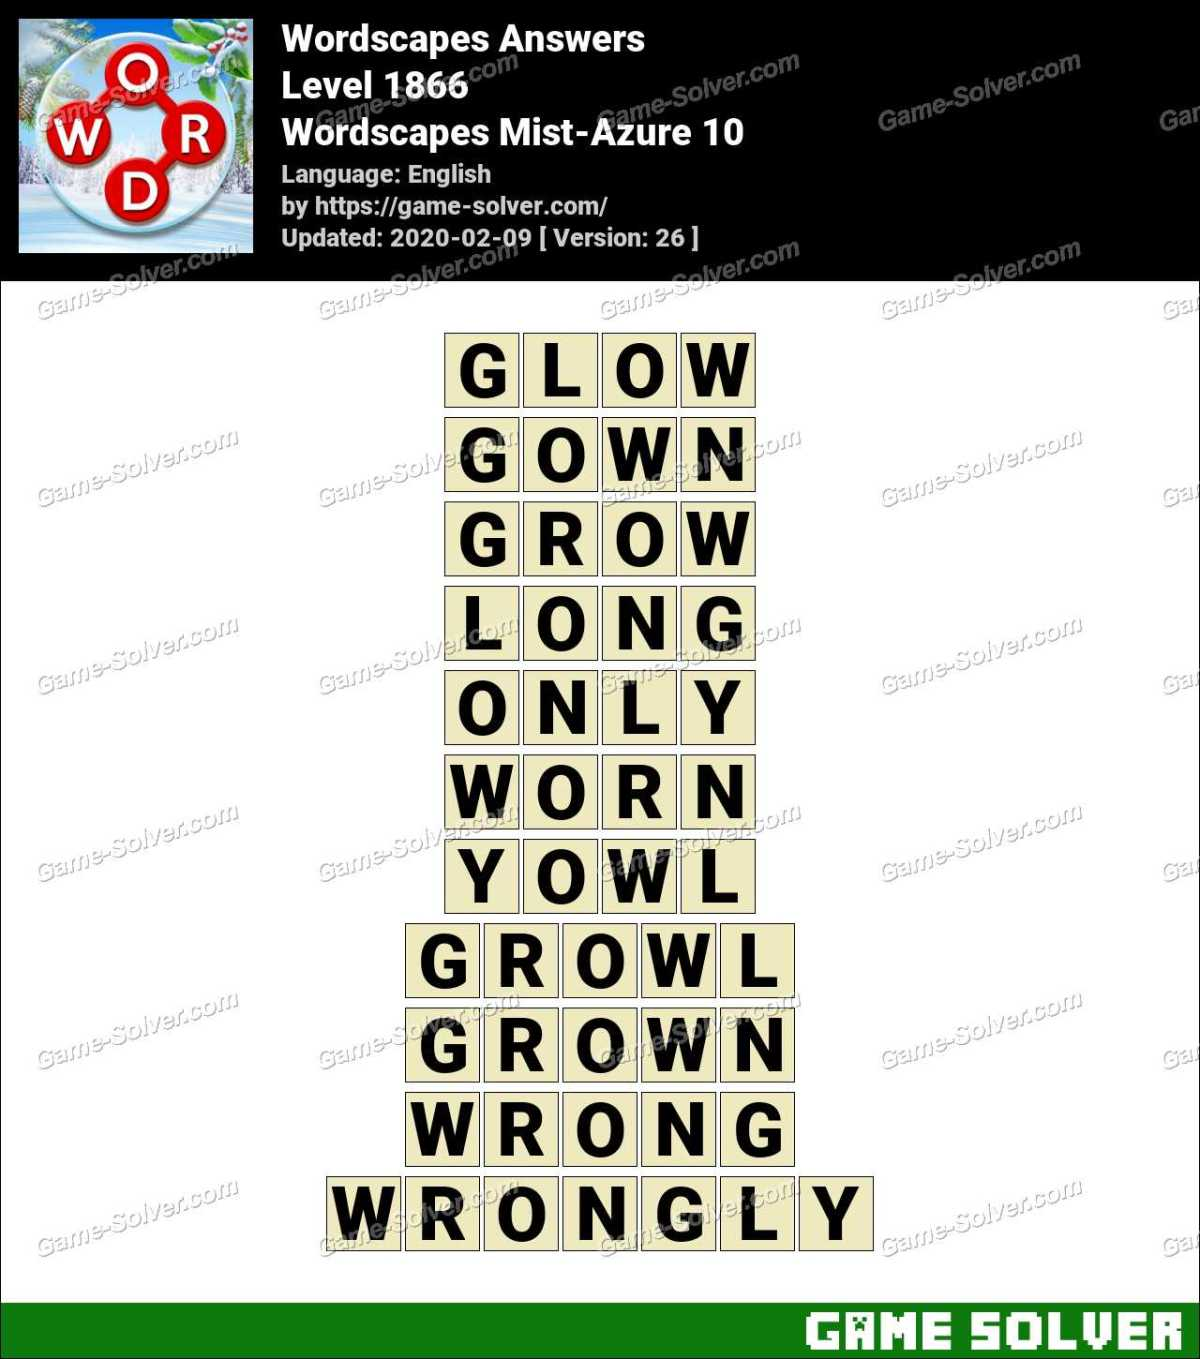 Wordscapes Mist-Azure 10 Answers